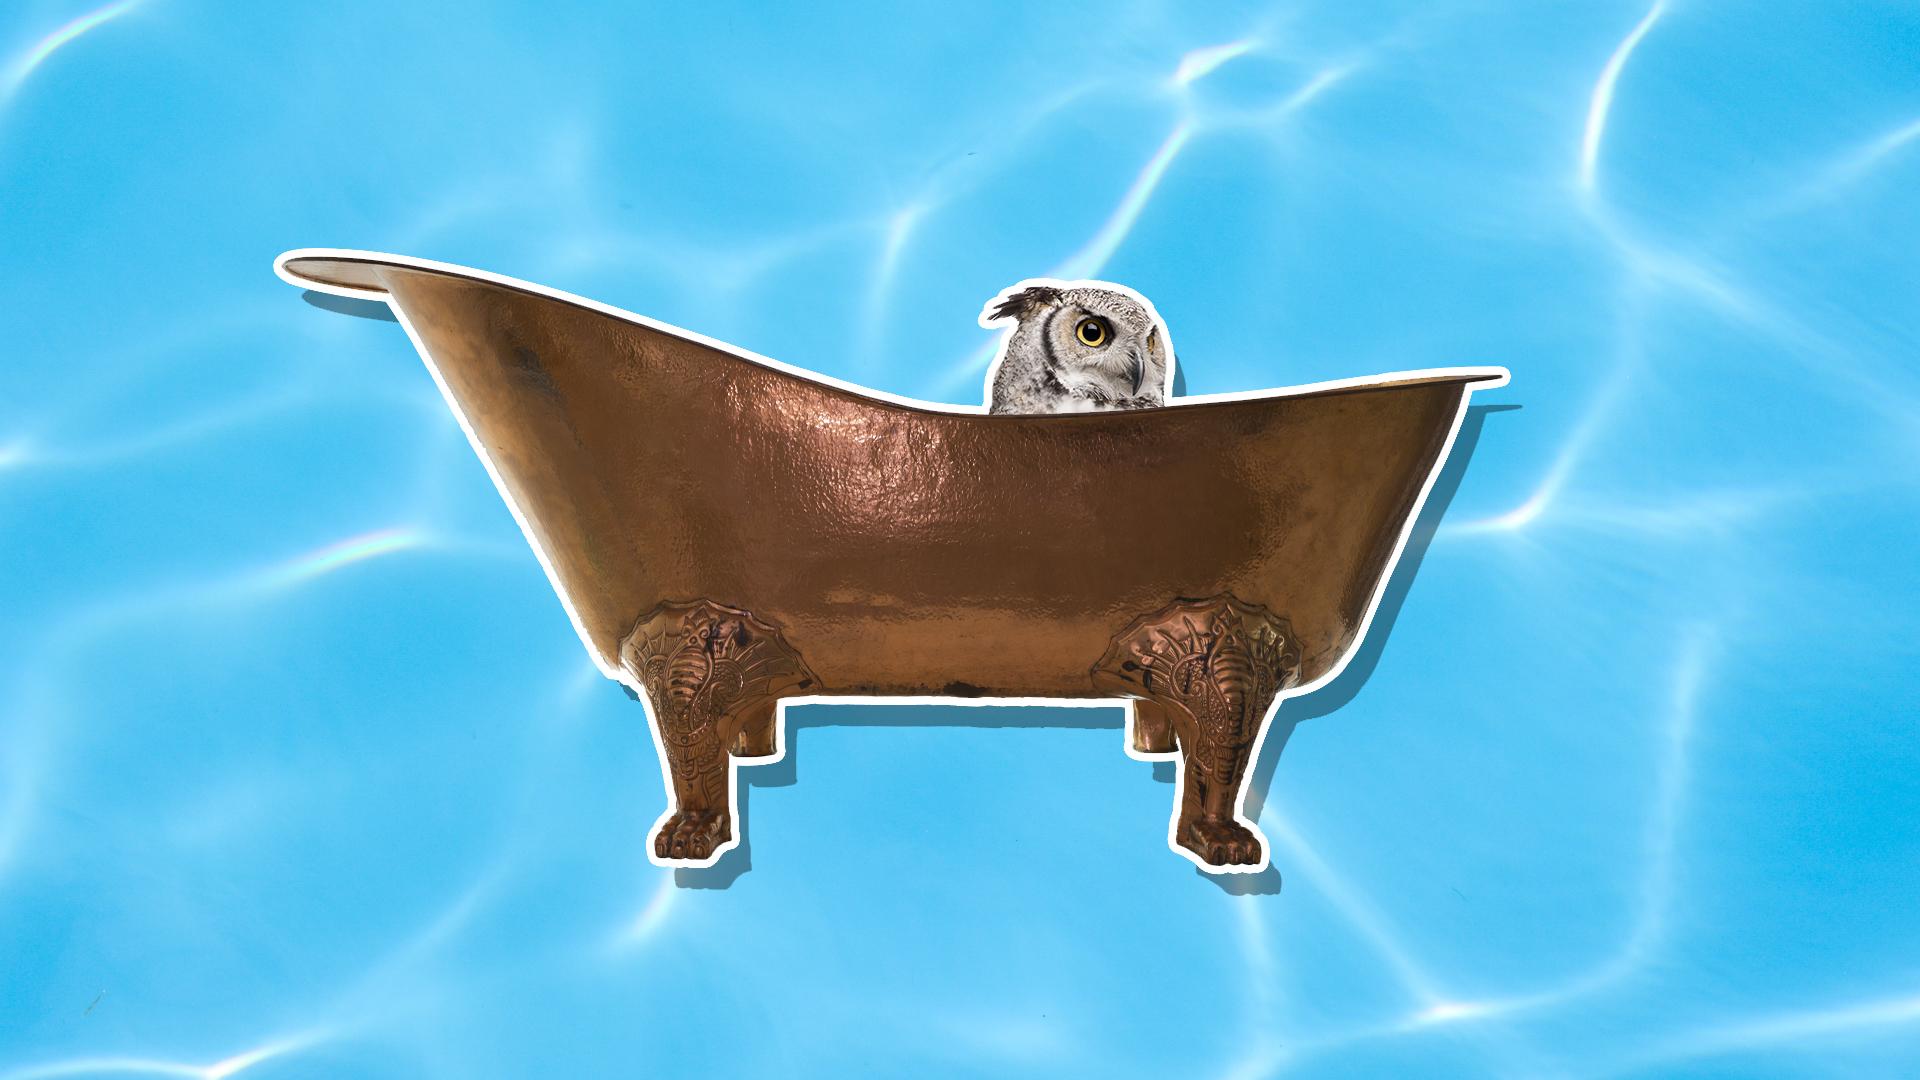 An owl in a copper bath